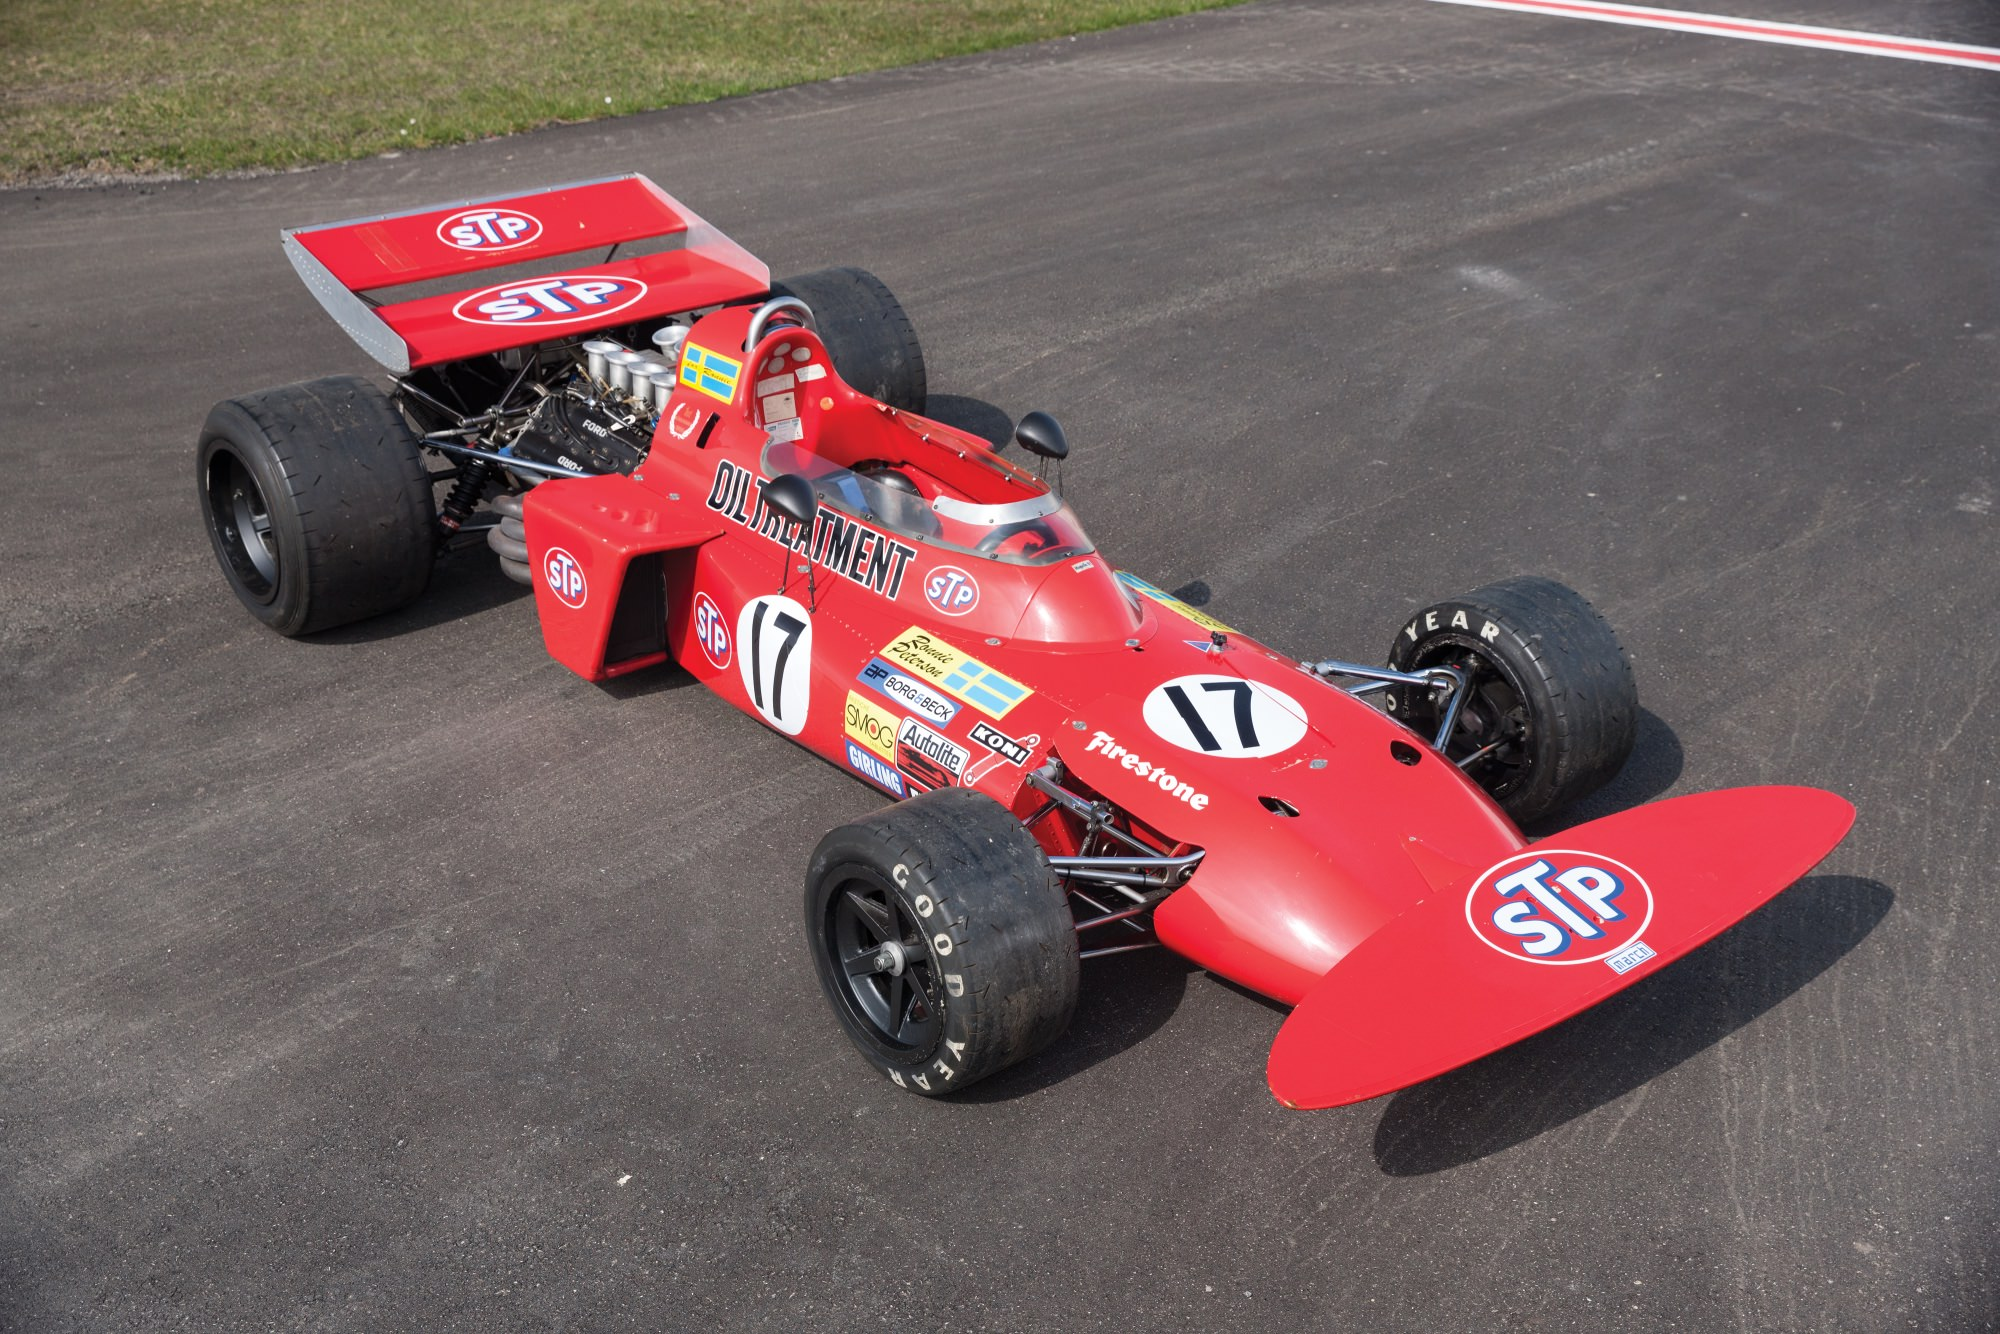 Niki Lauda's March 711 Formula 1 Car  Silodrome